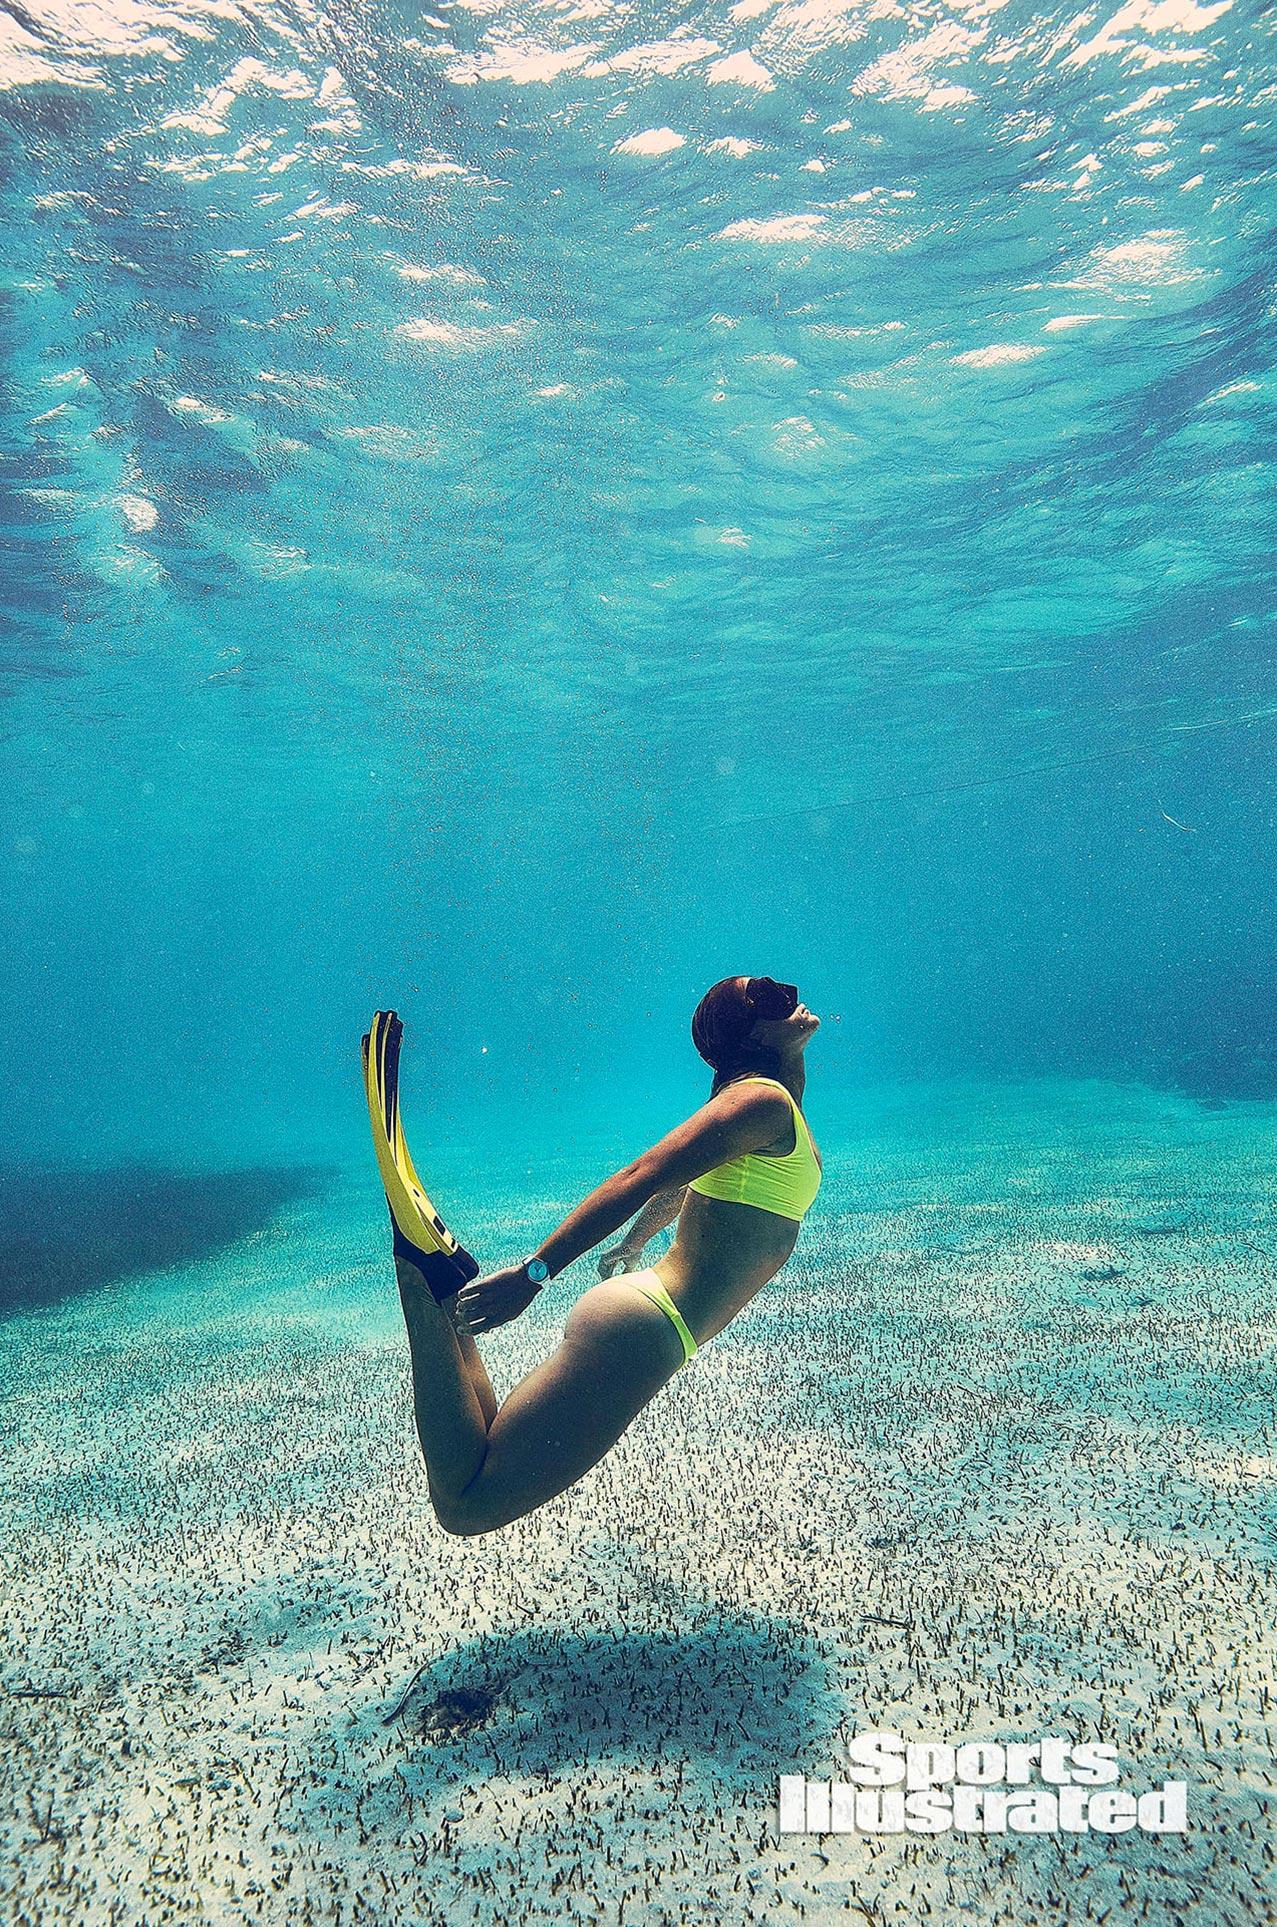 Кортни Конлог в каталоге купальников Sports Illustrated Swimsuit 2020 / фото 07